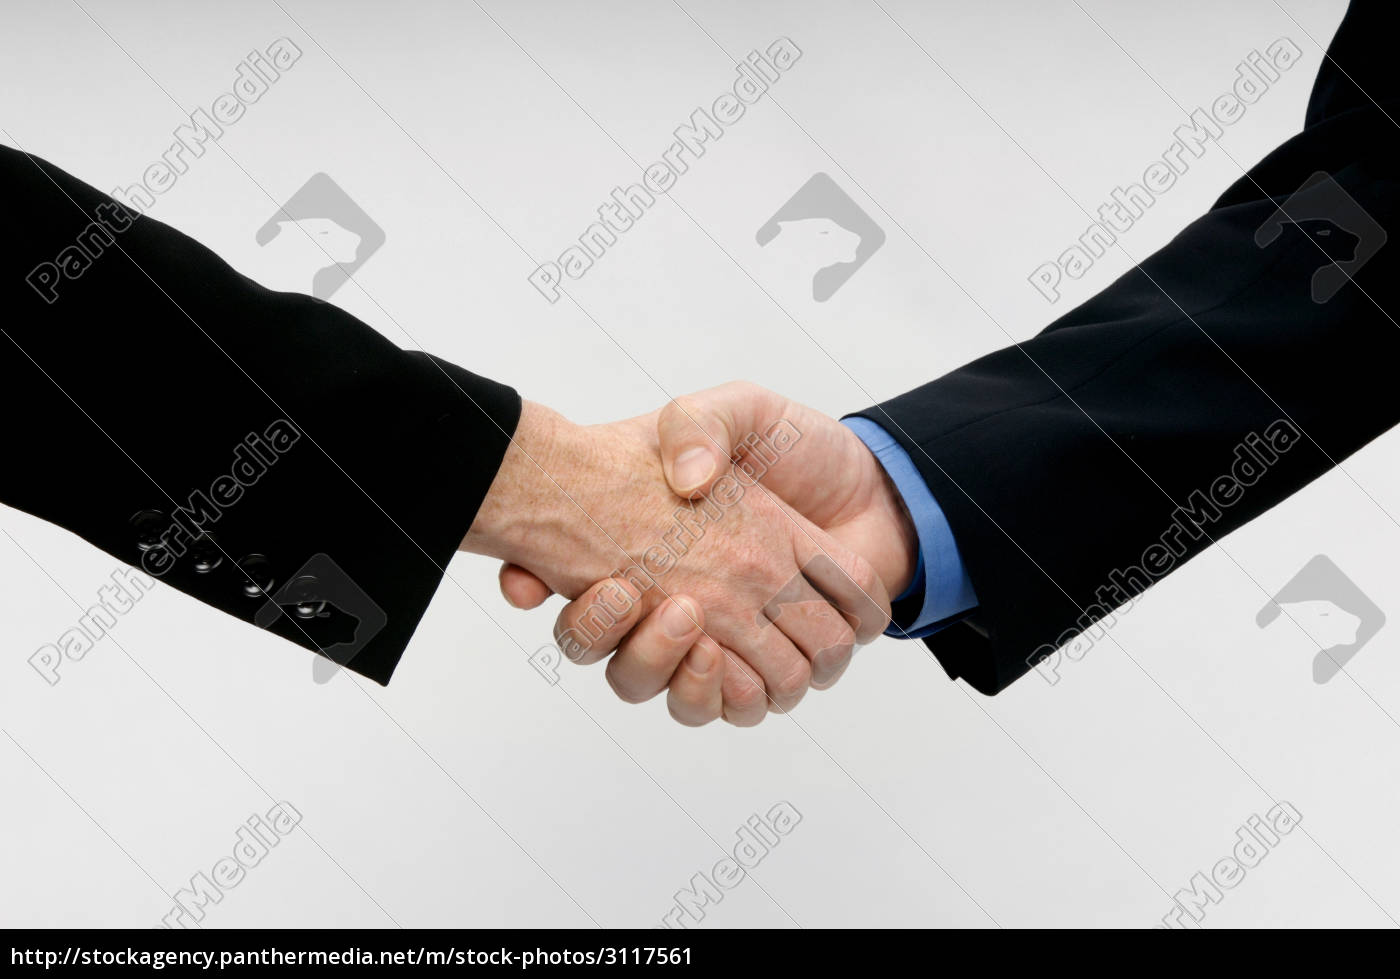 professional, hand, shake - 3117561